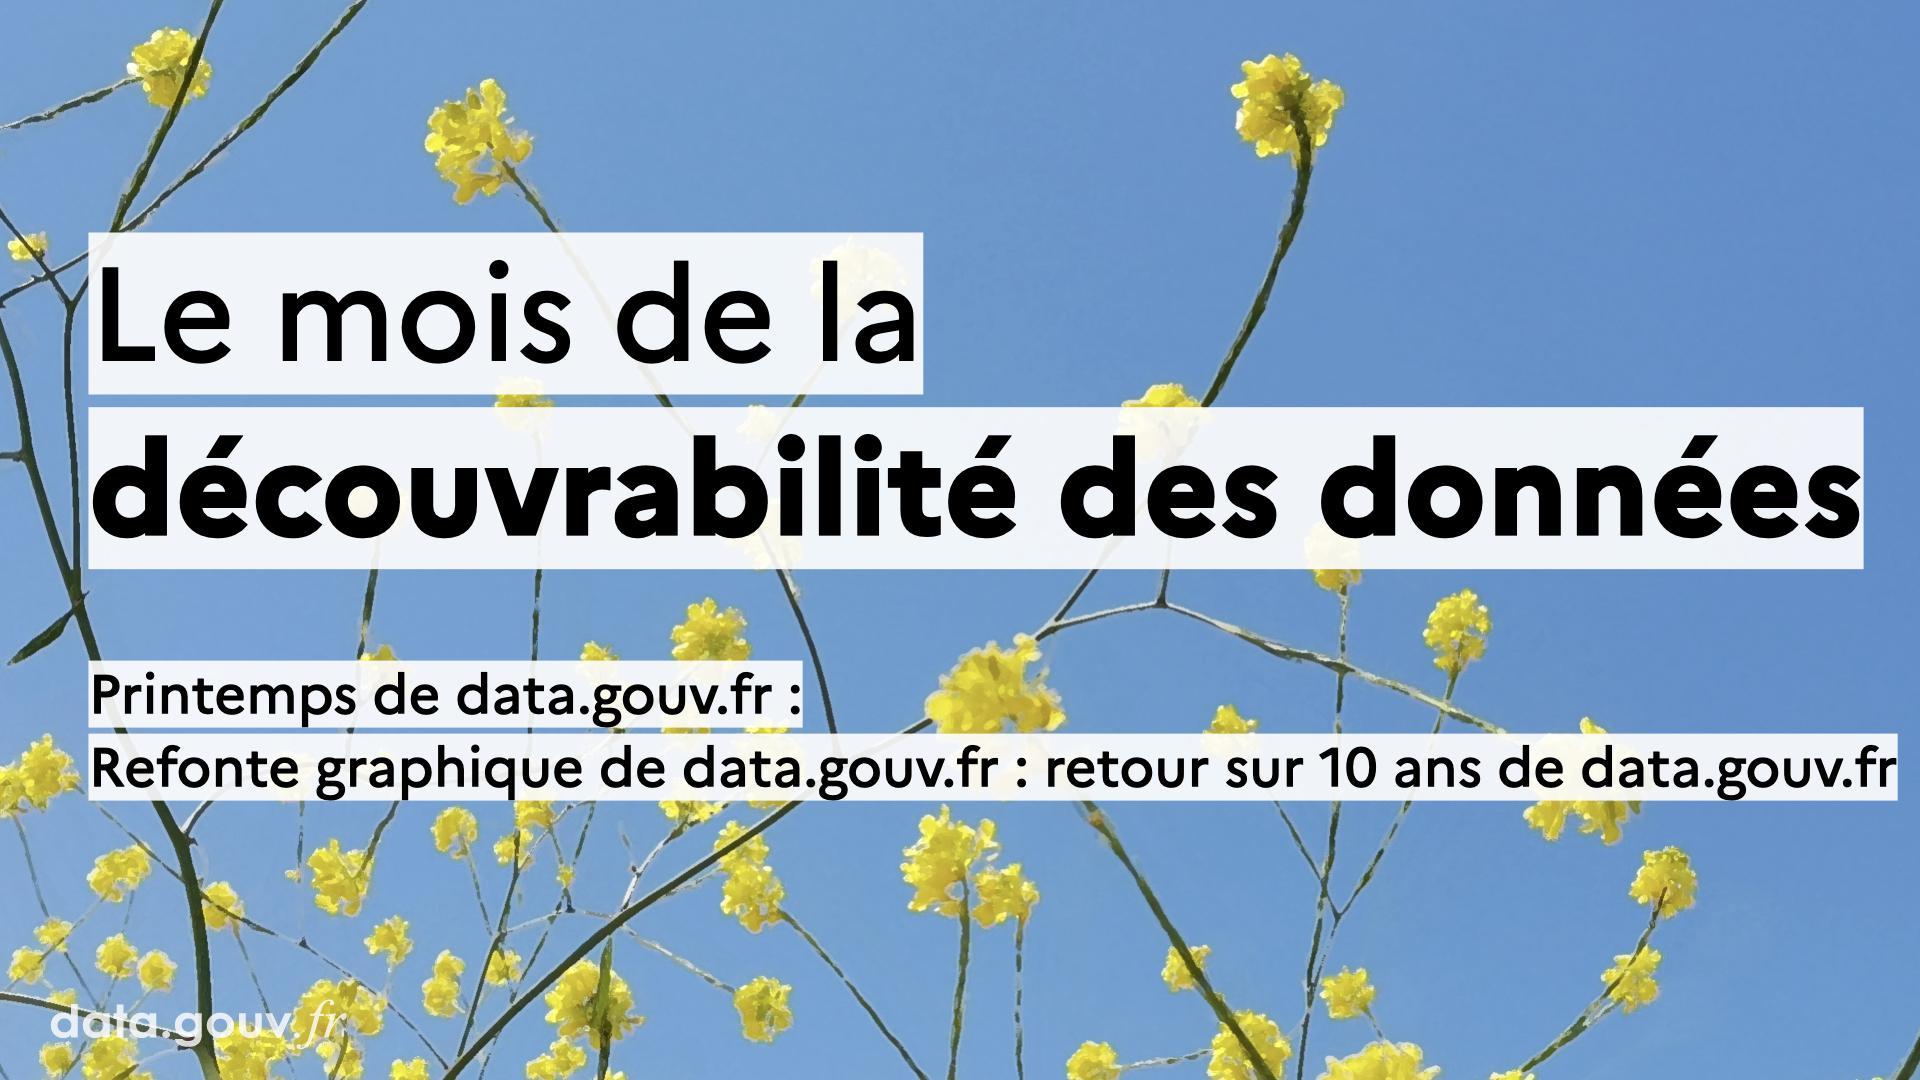 Refonte graphique de data.gouv.fr : retour sur 10 ans de data.gouv.fr